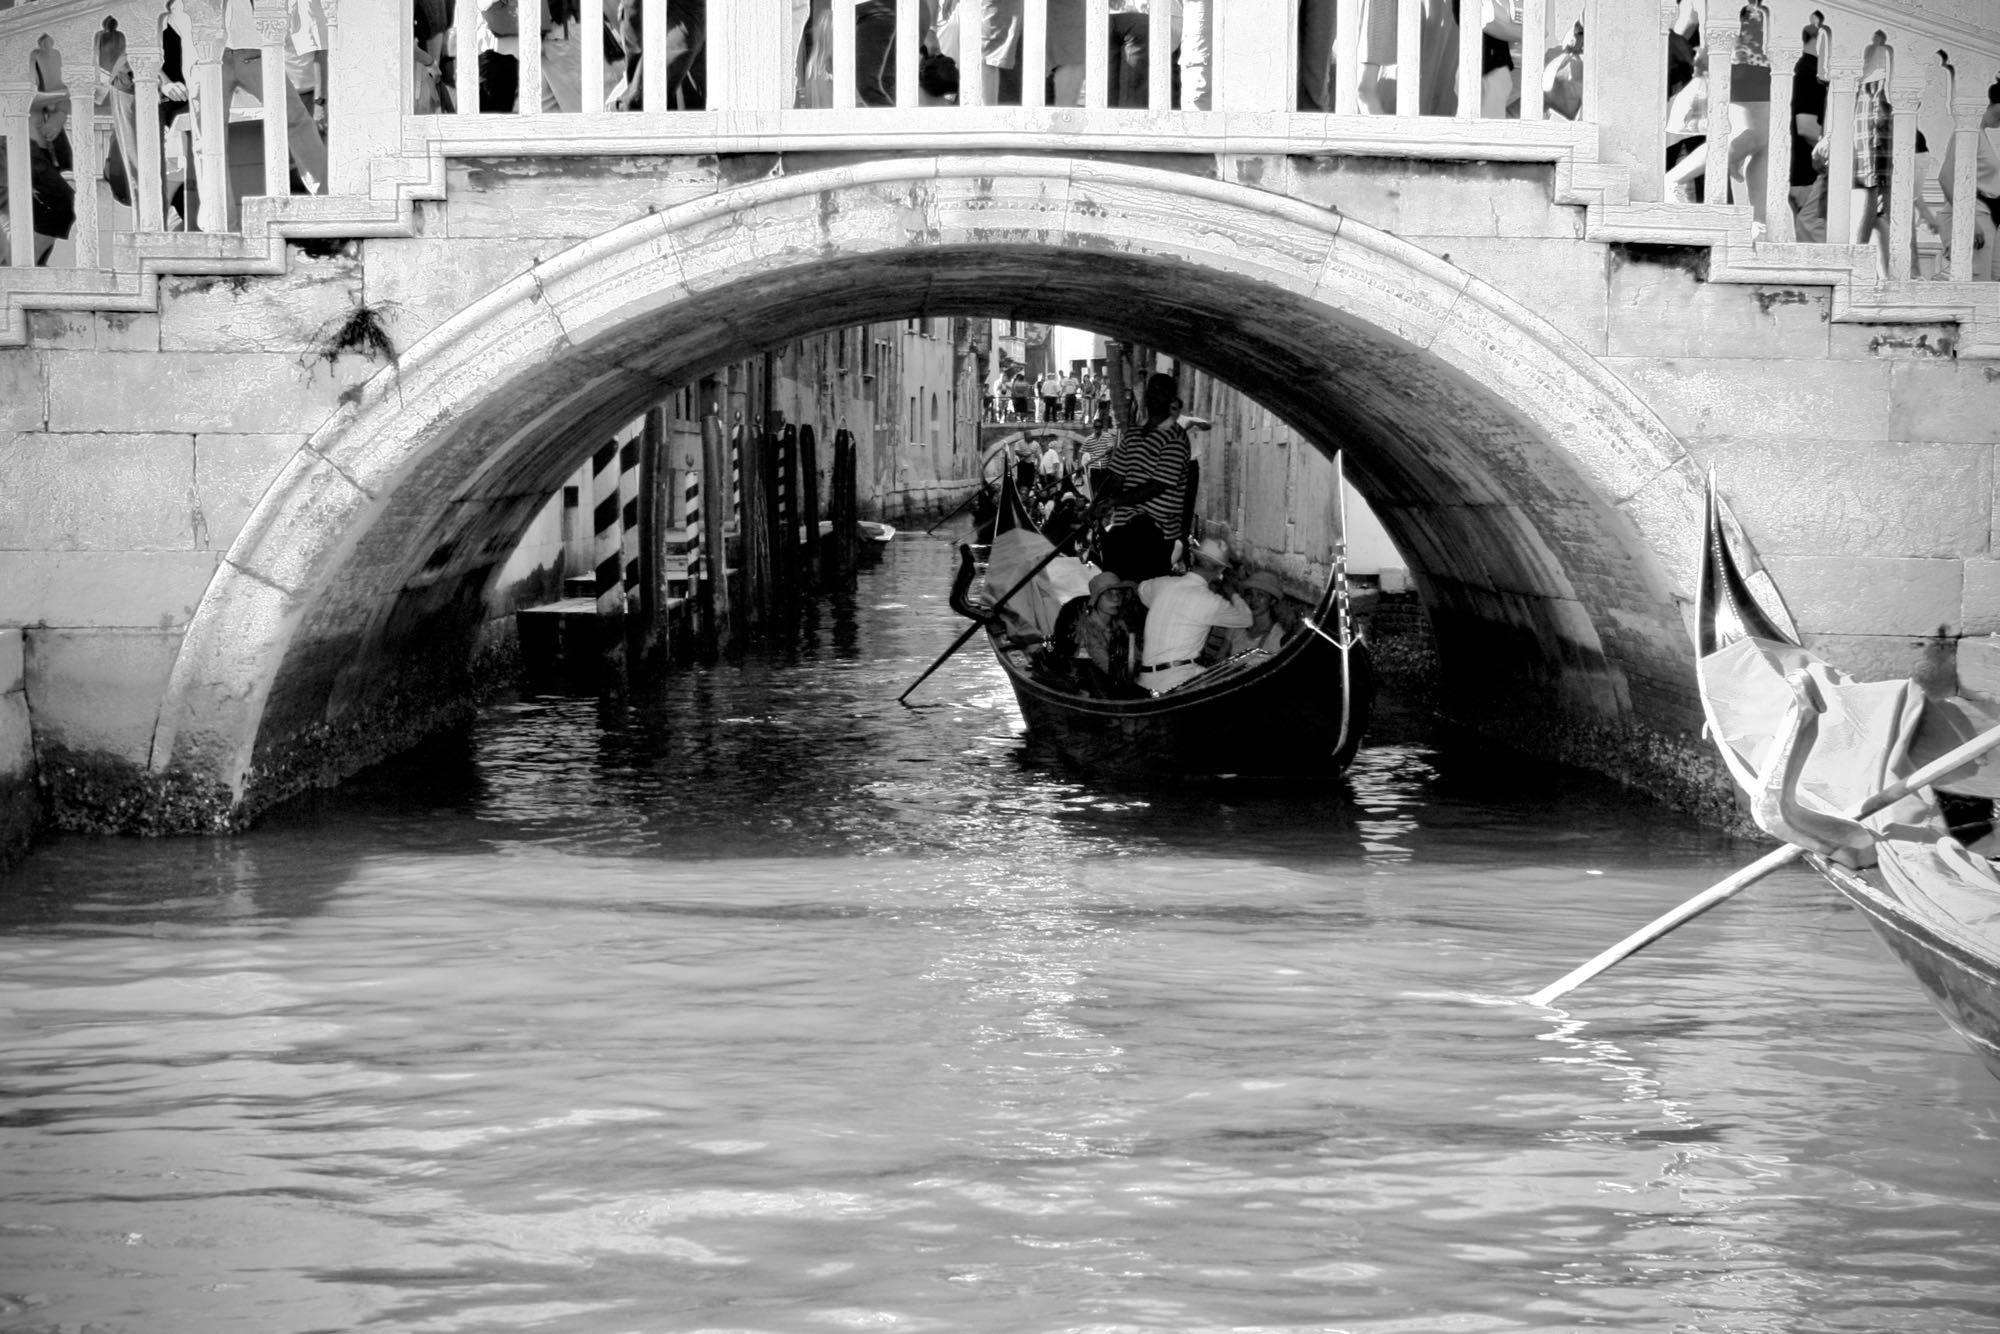 Massimiliano Scarpa_photographer_Canal Grande_gondole_2017 - 1 (2)